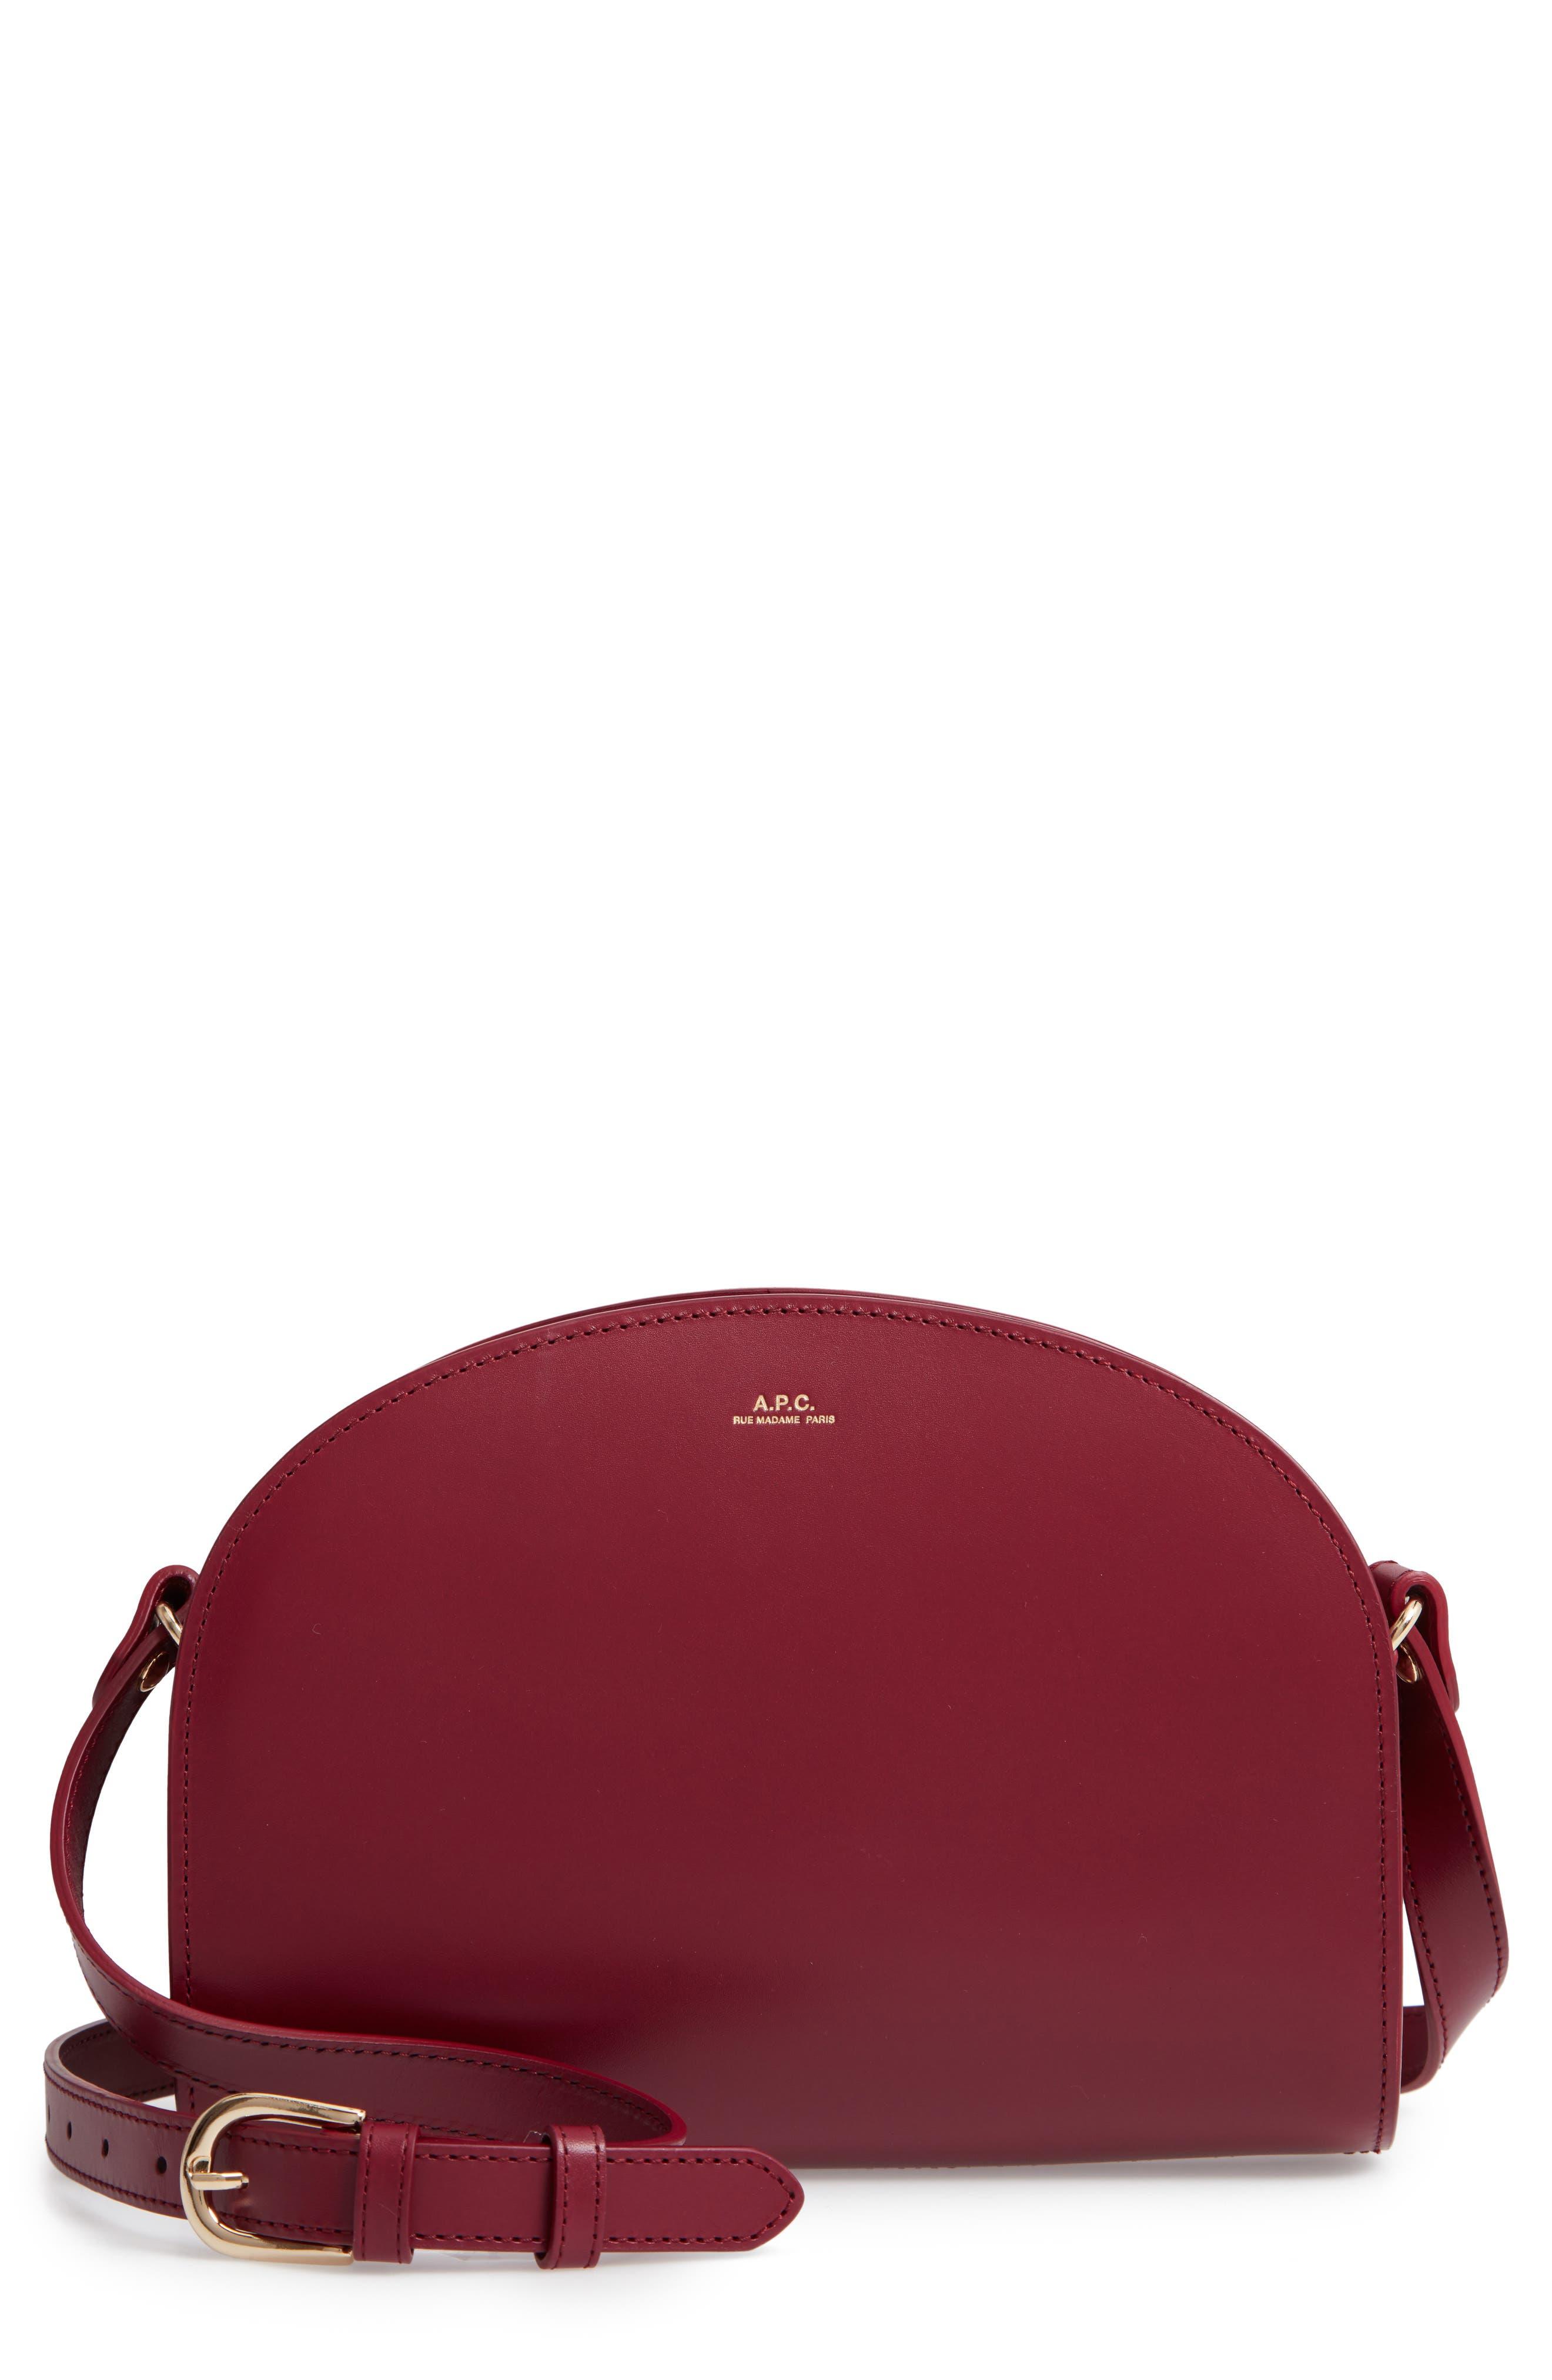 Sac Demi Lune Leather Crossbody Bag,                             Main thumbnail 1, color,                             FRAMBOISE